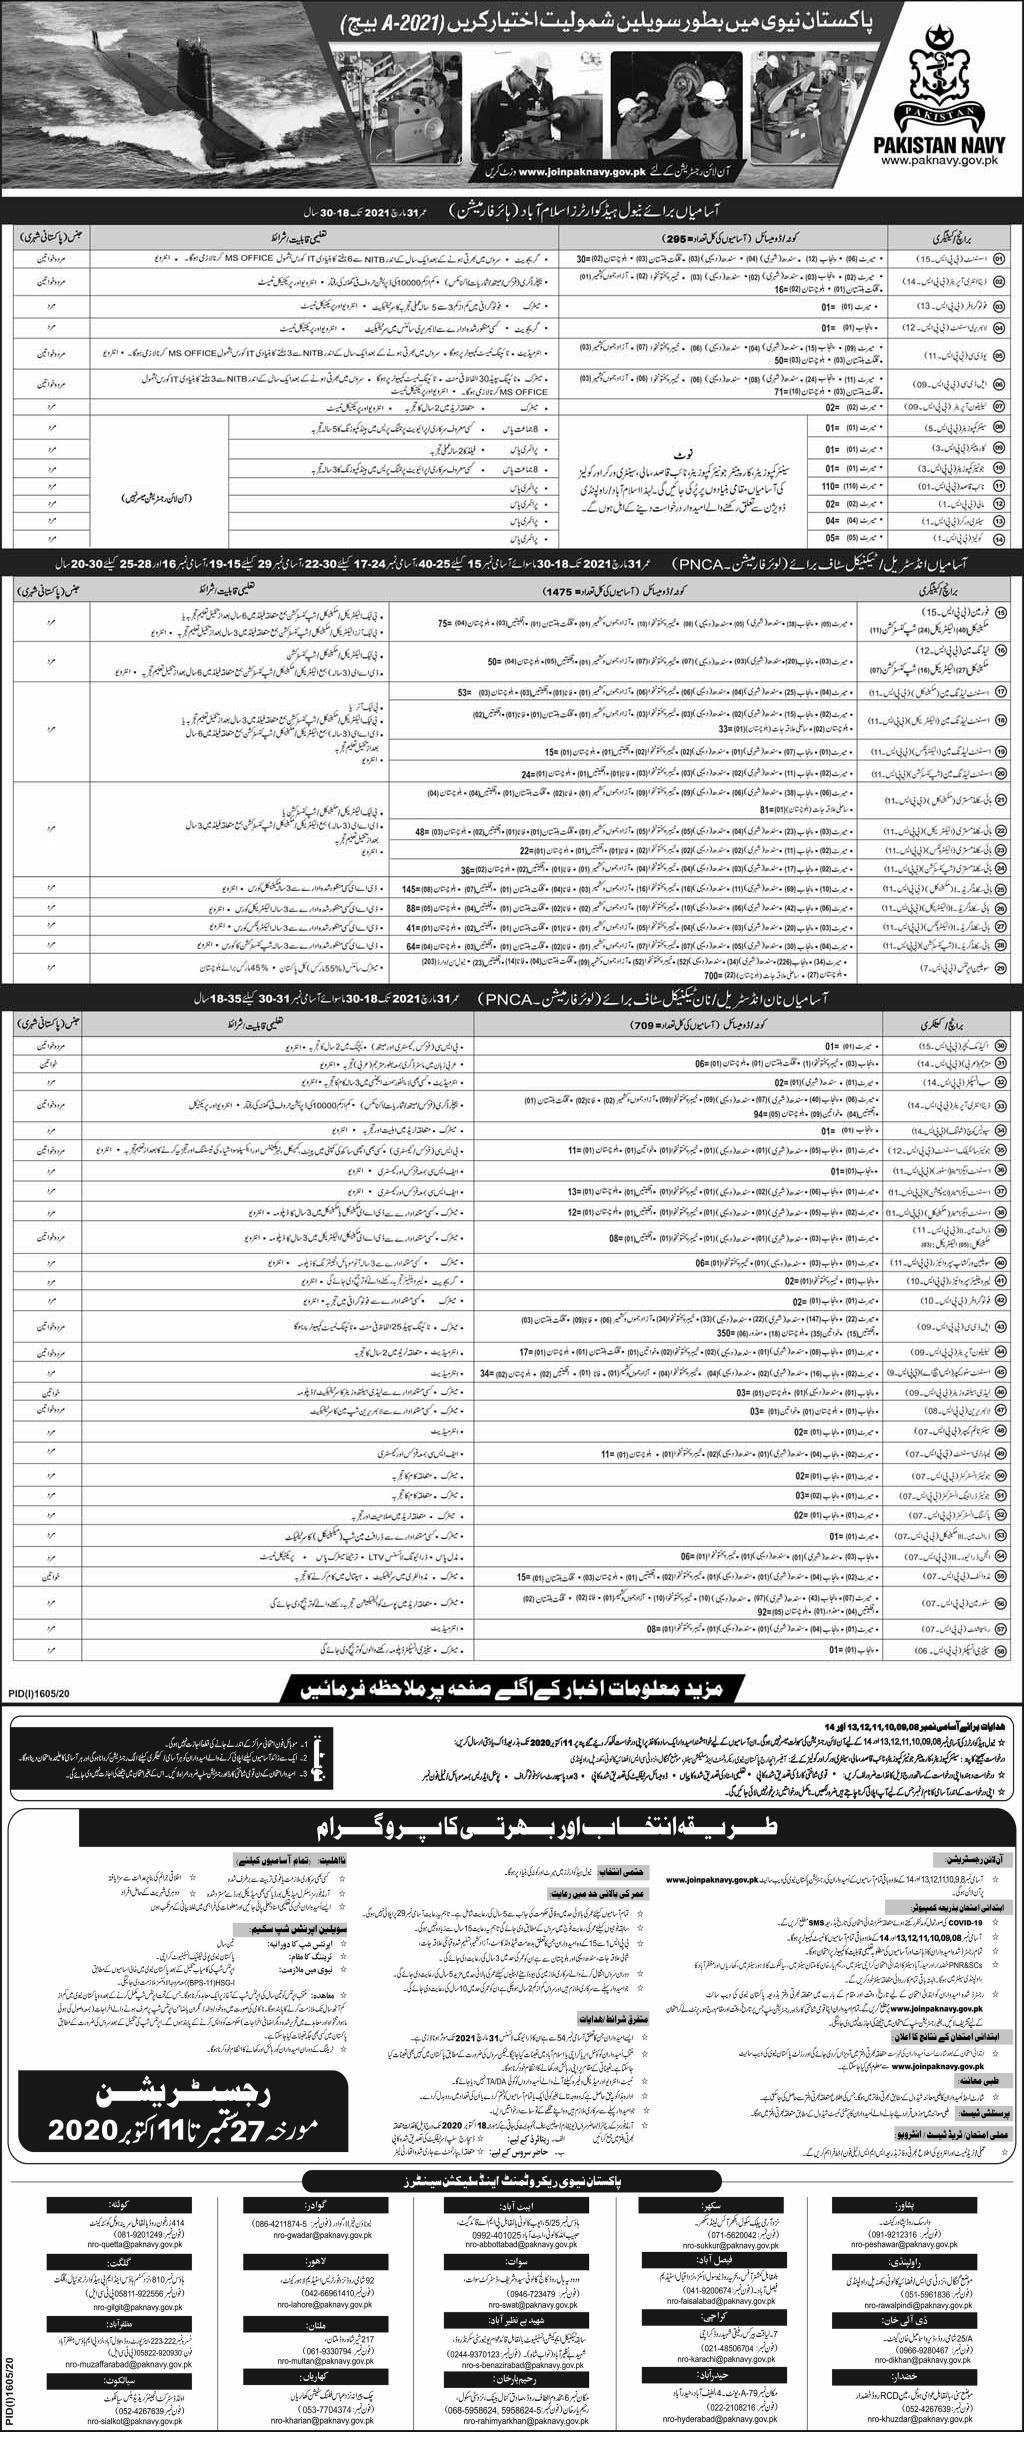 Join Pak Navy Civilian Batch A 2021 Register Online Eligibility Criteria Last Date